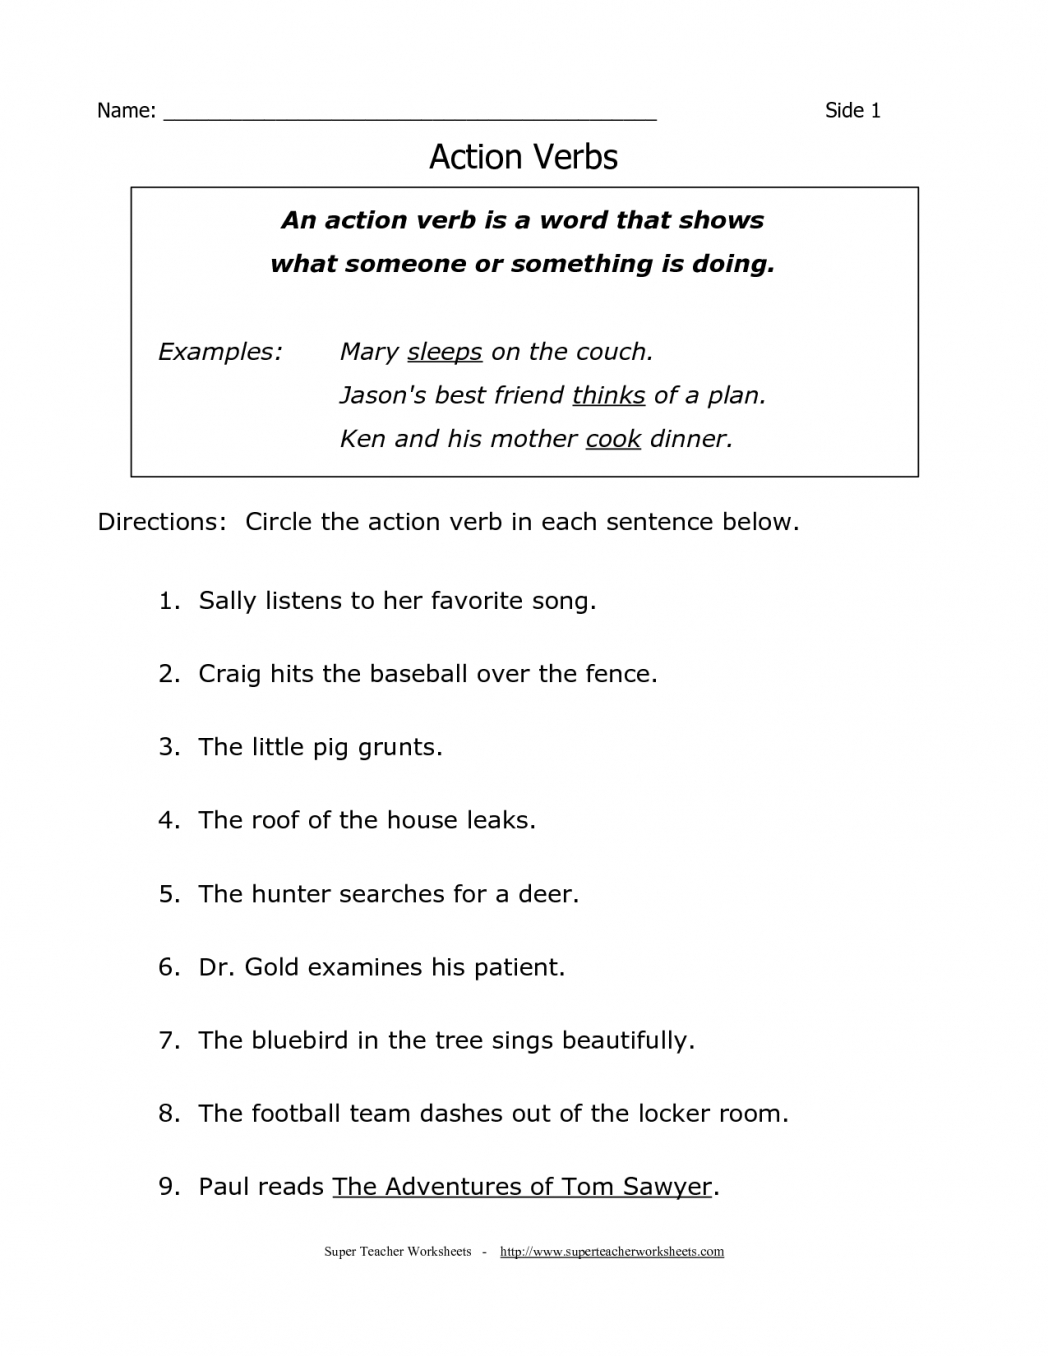 Third Grade Grammar Worksheets To Print | Worksheet News - Free Printable Third Grade Grammar Worksheets